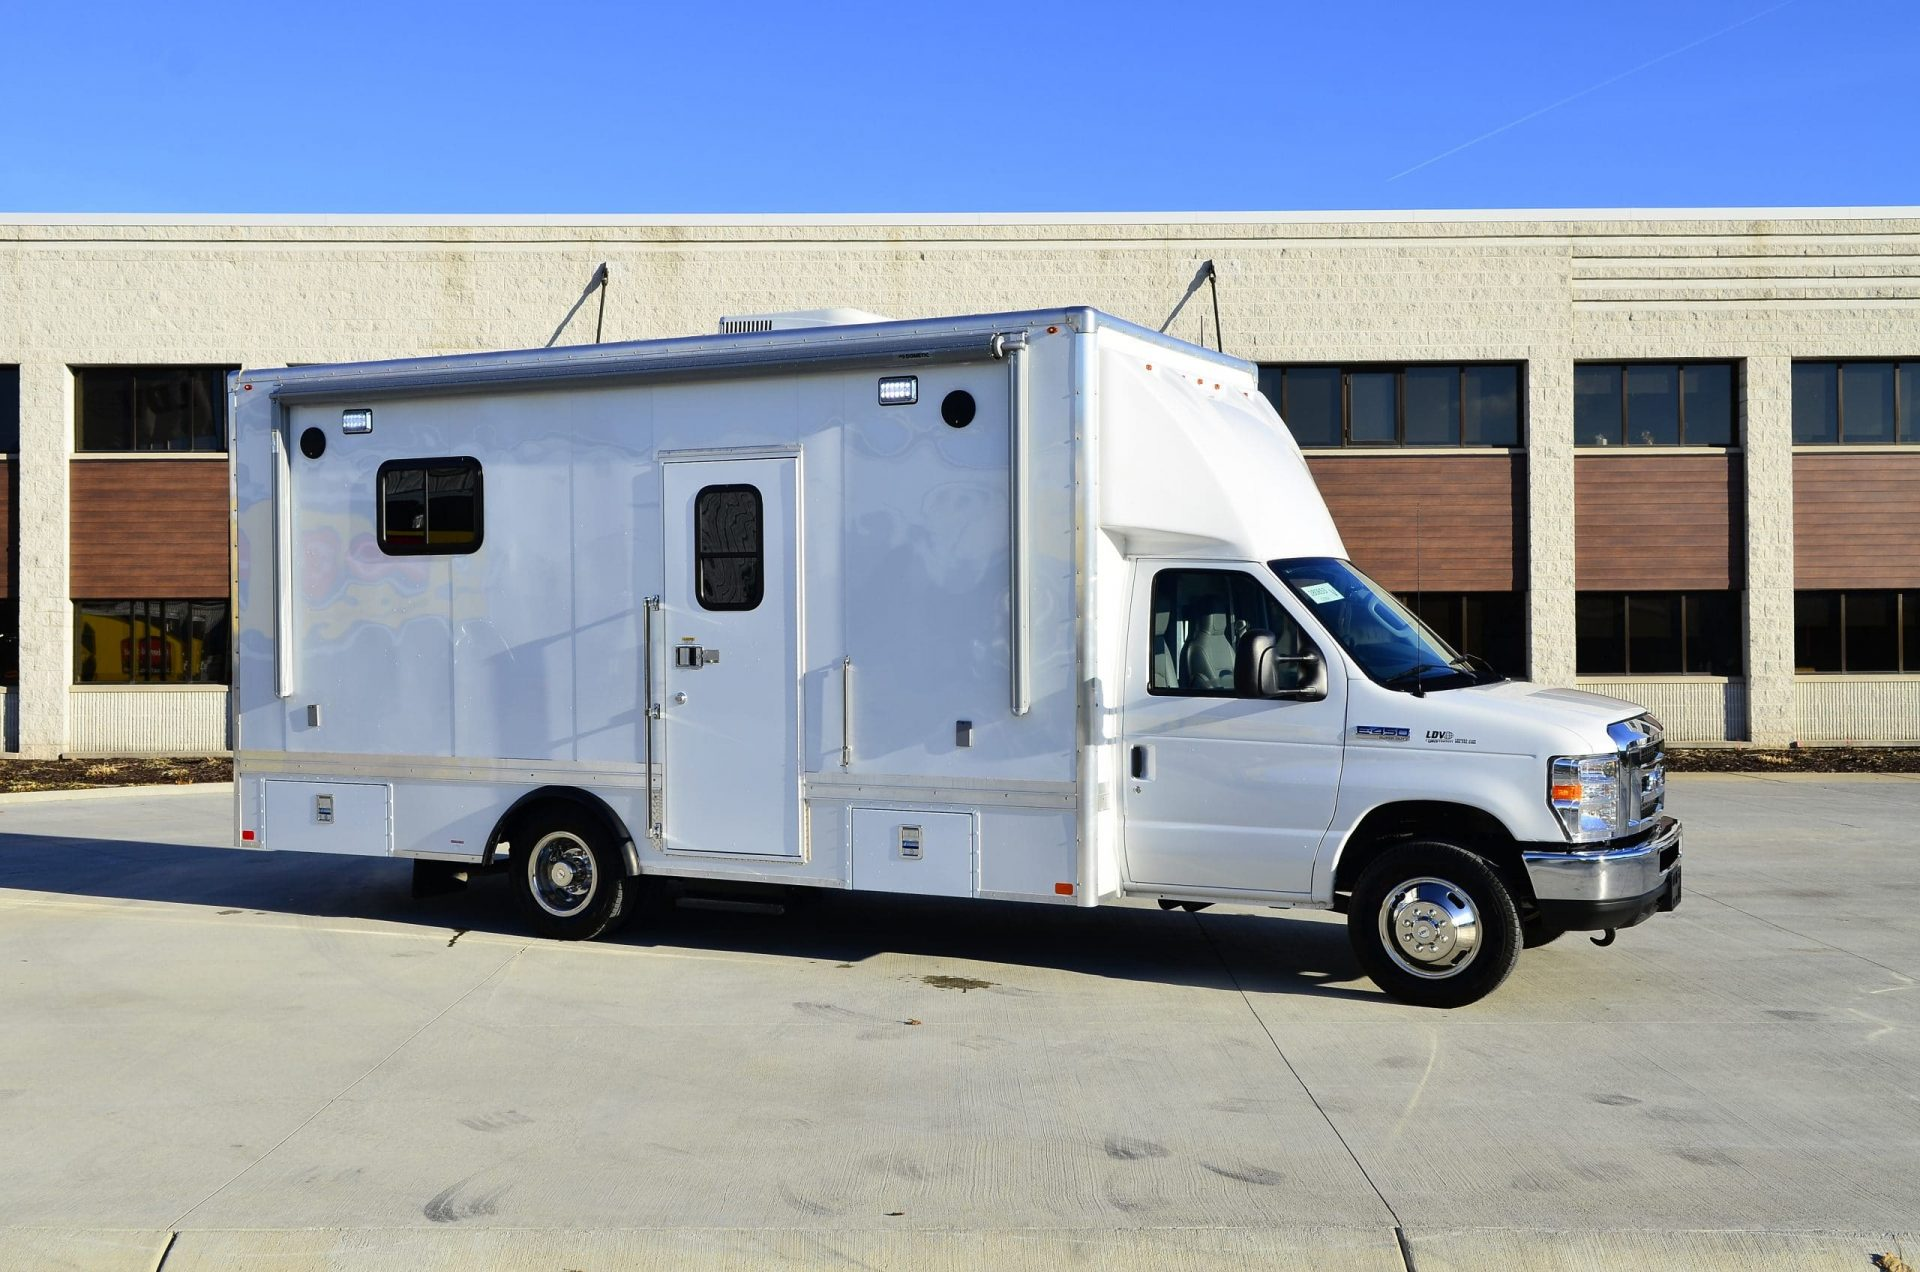 LDV bookmobile Tulsa City County